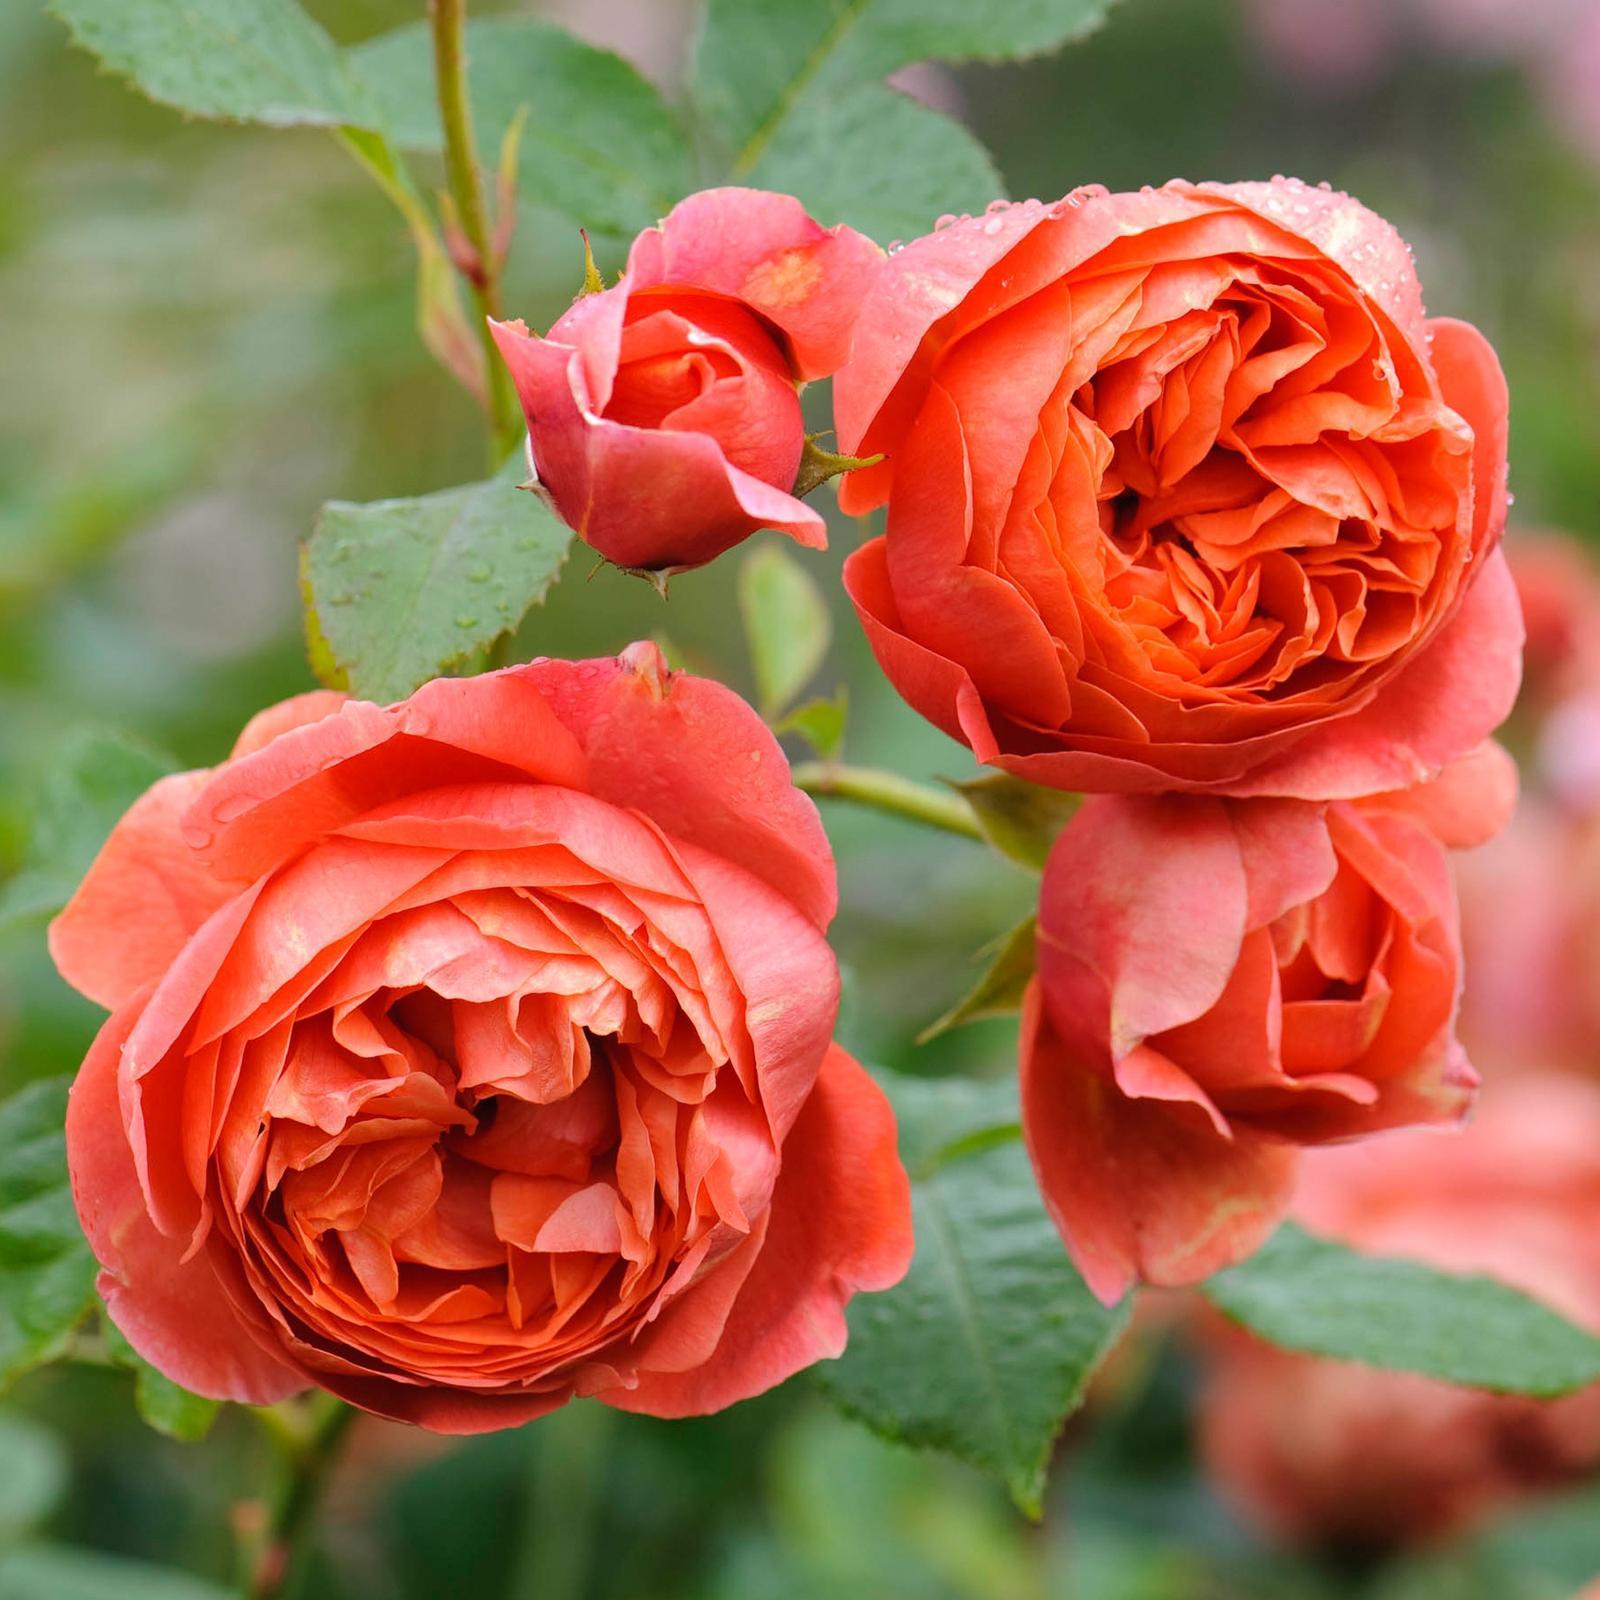 David Austin rosen - Summer song tuto mam v crepniku, ta je nadherna aj ked oranzove ruze nemusim